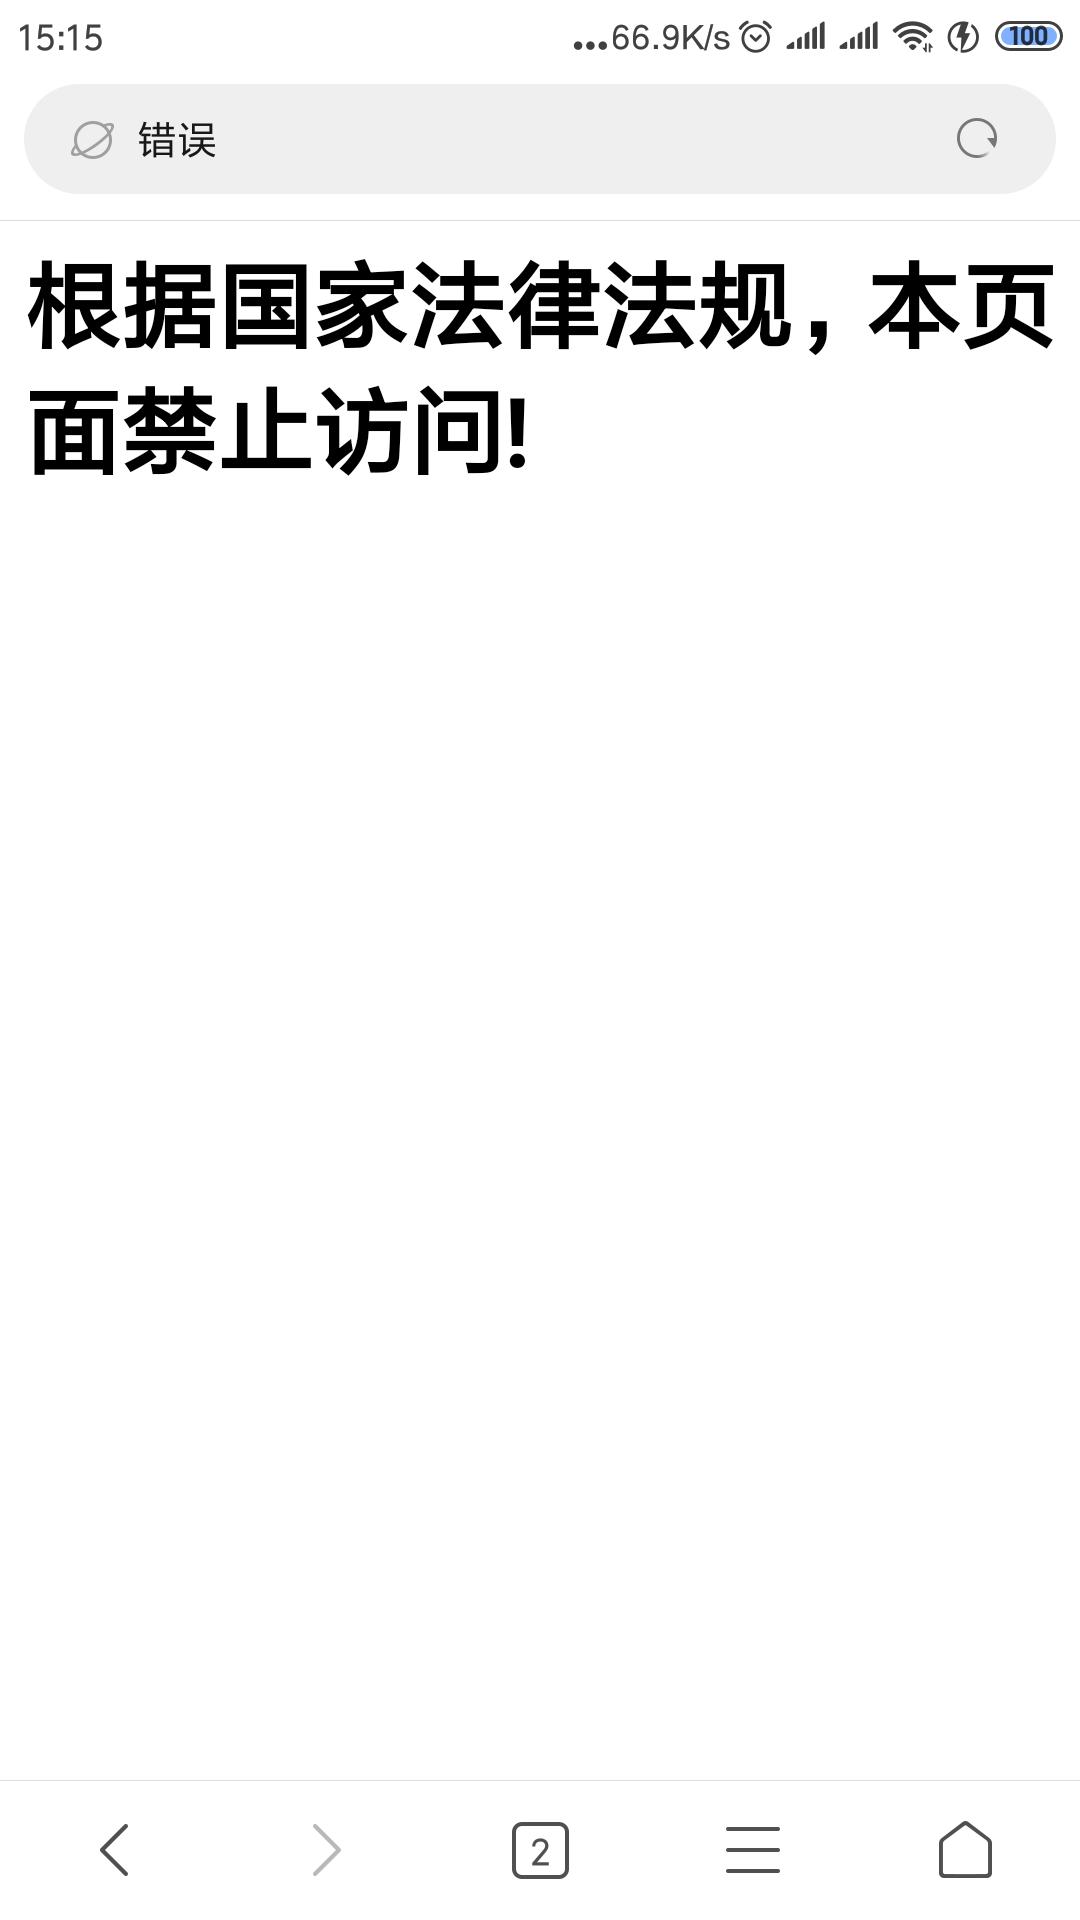 Screenshot_2019-04-02-15-15-42-335_com android br